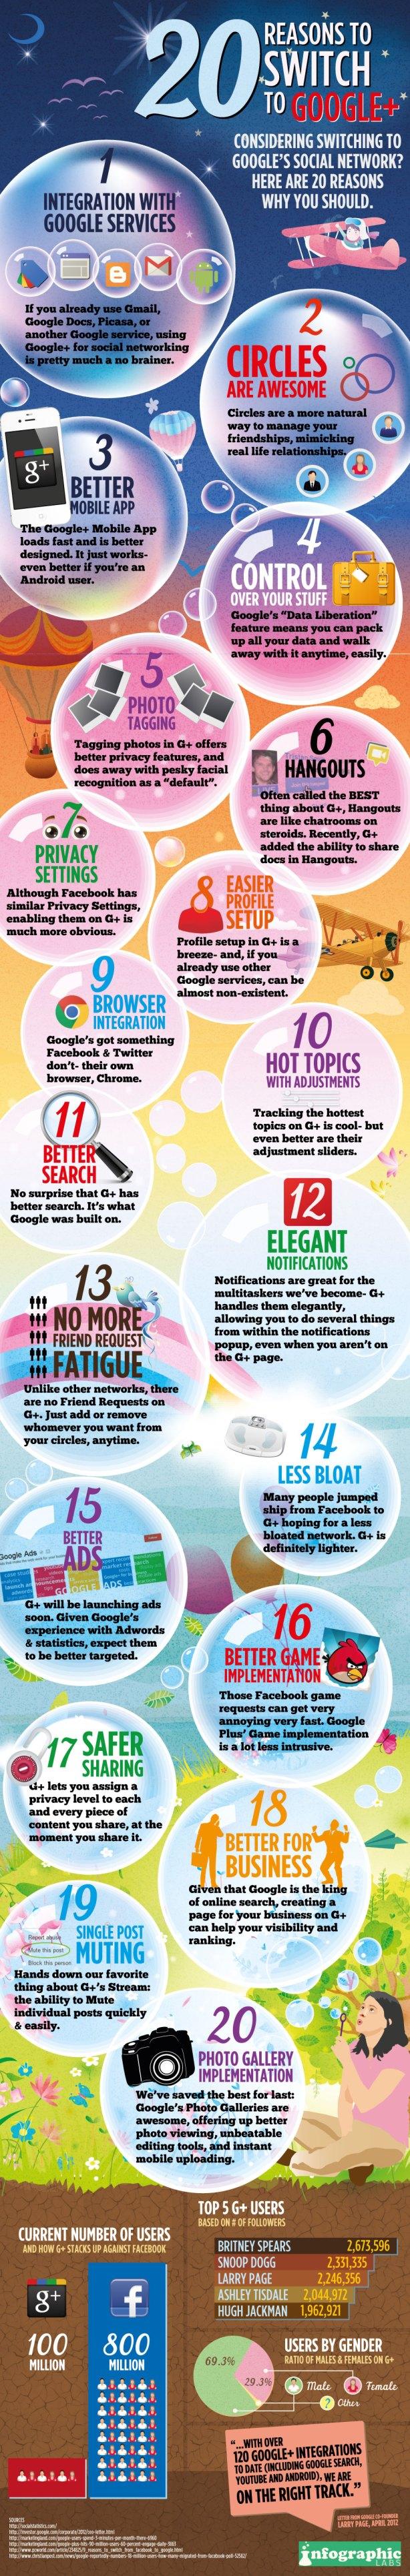 gplus igl 20 razones para cambiar a Google+ [Infografía]